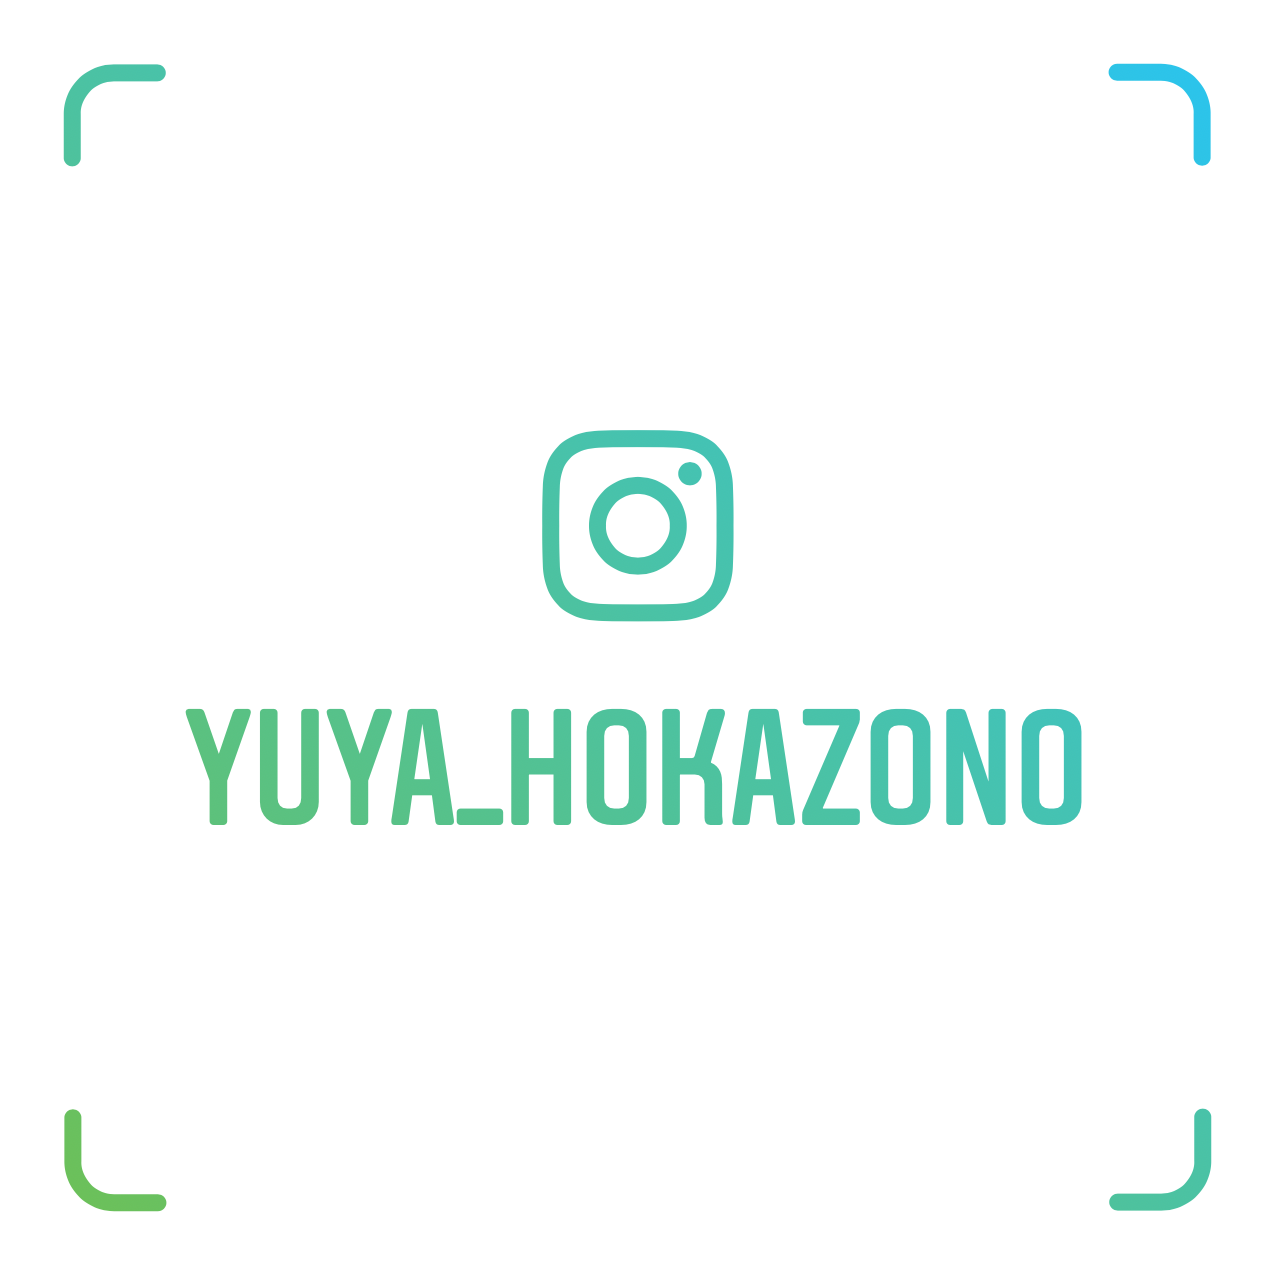 ☆「Yuya Hokazono」の公式Instagramはこちら